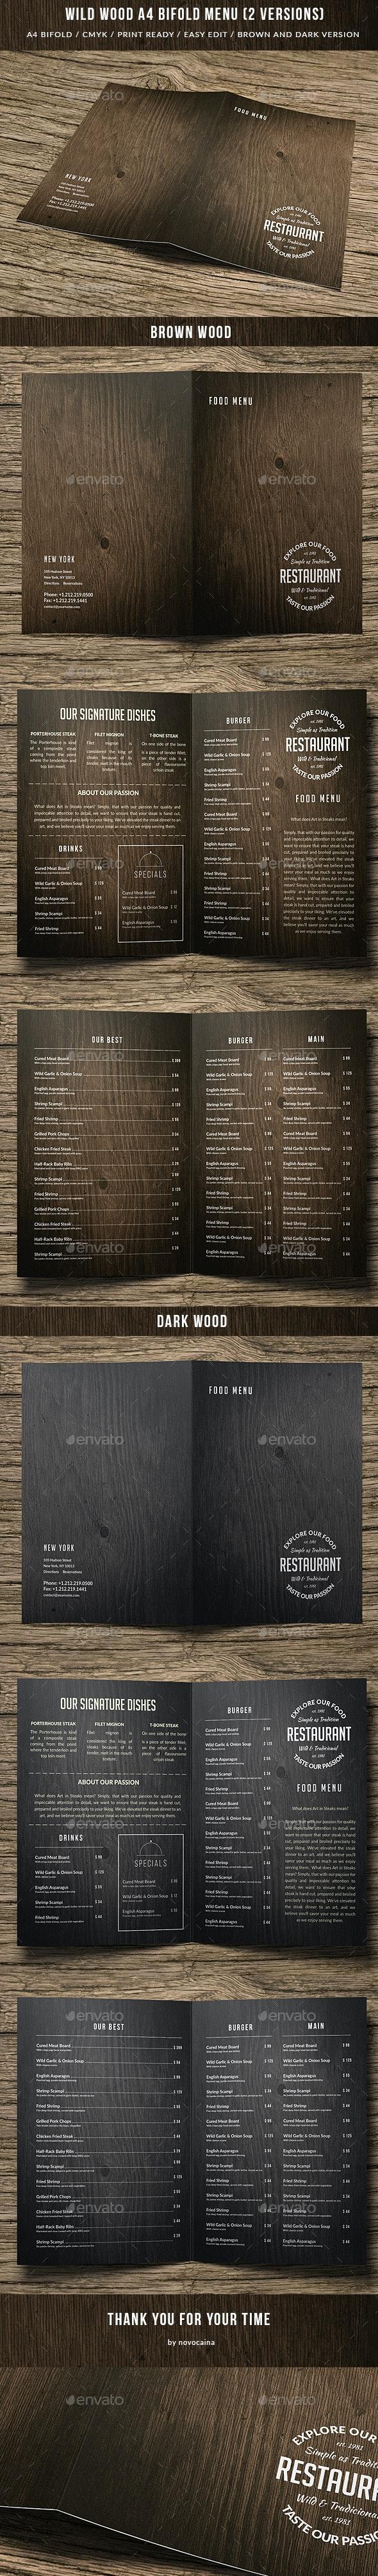 Wild Wood A4 Bifold Menu - 2 Versions - Food Menus Print Templates